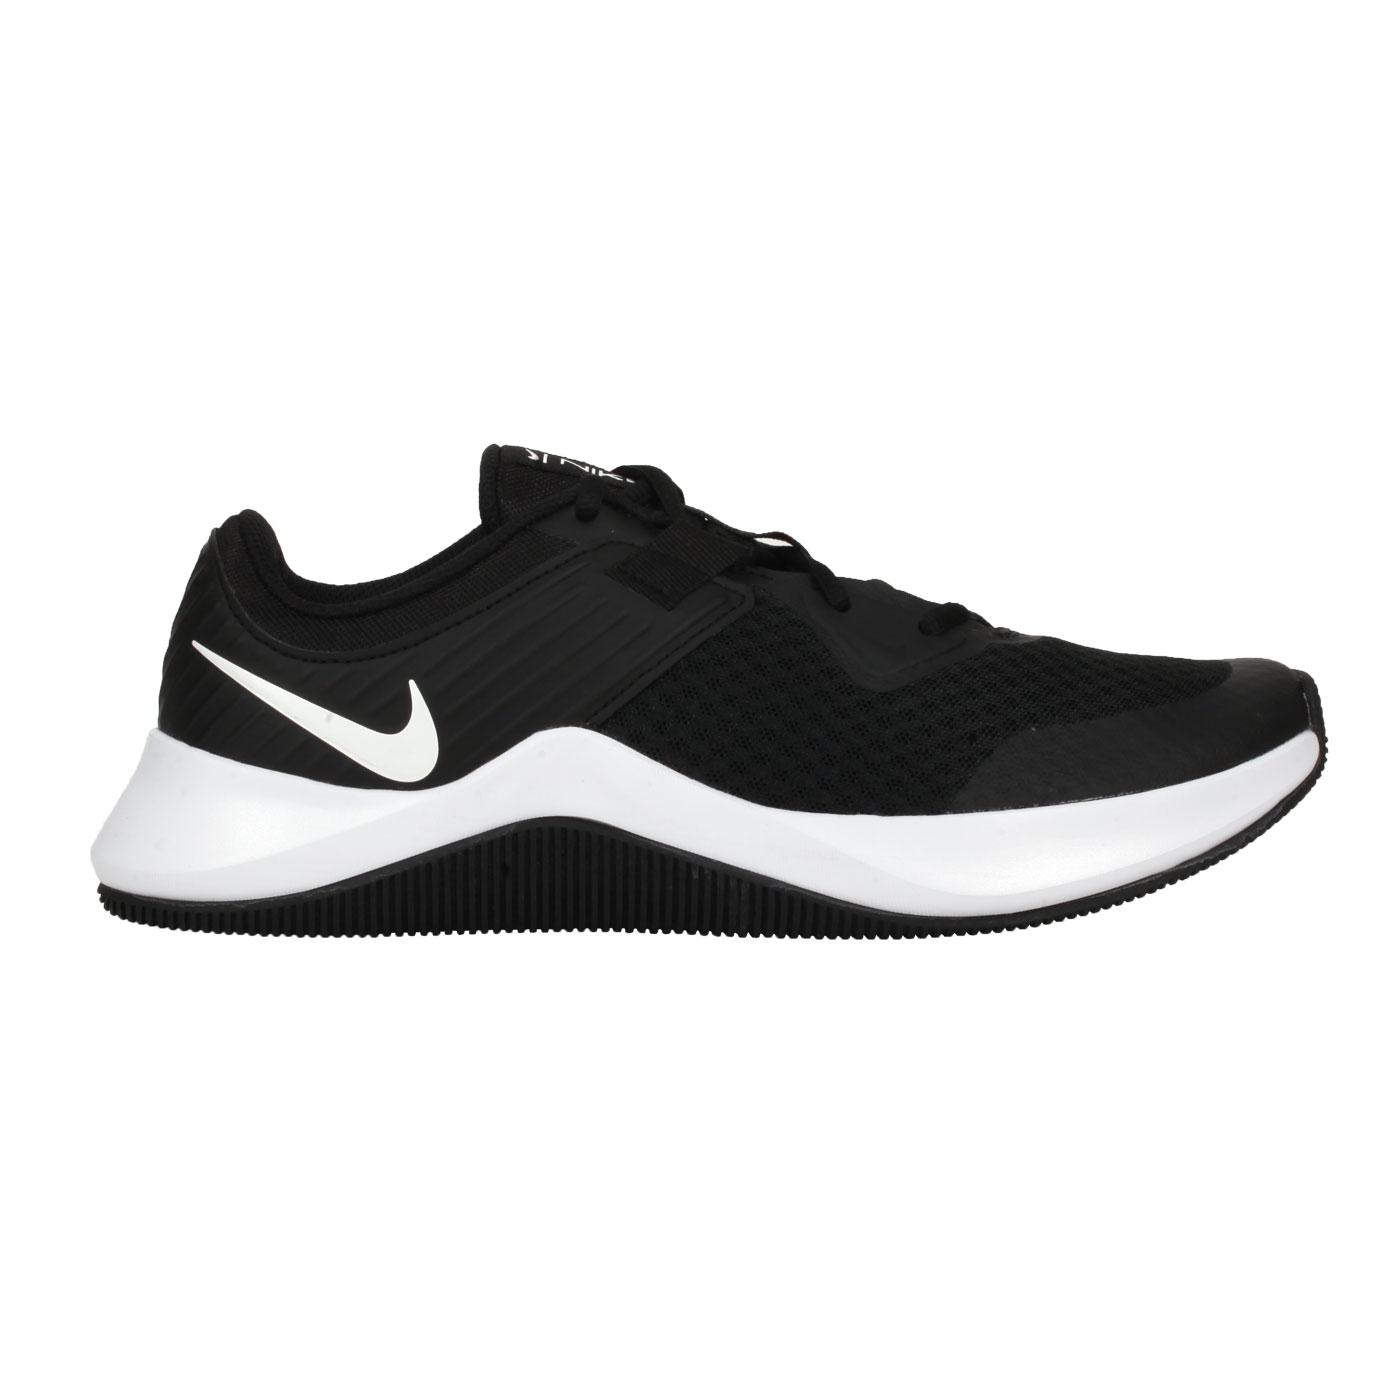 NIKE 男款慢跑鞋  @MC TRAINER@CU3580002 - 黑白